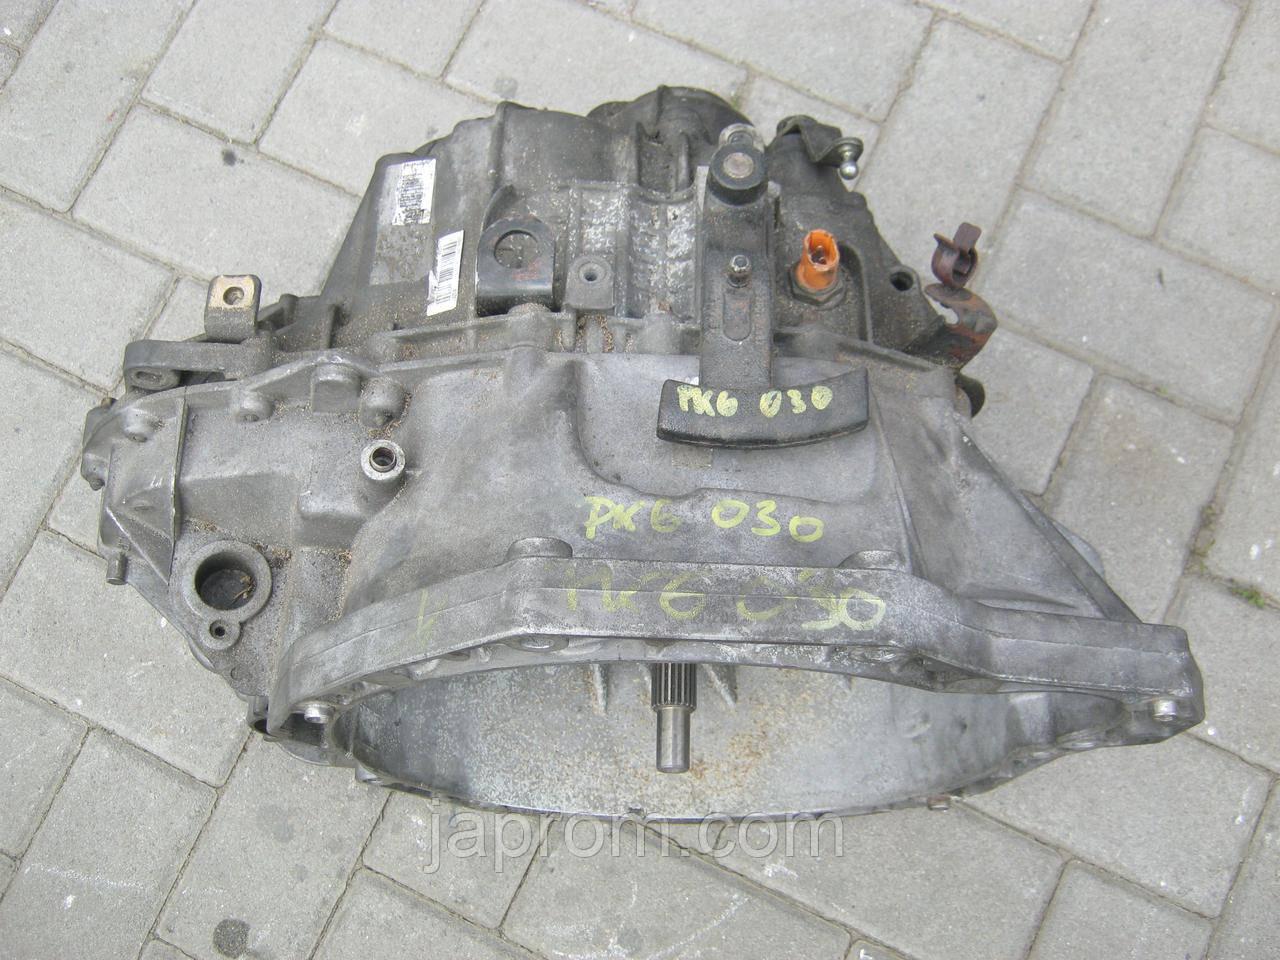 МКПП механическая коробка передач Renault Master II, Opel Movano 2.5 DCi PK6 030